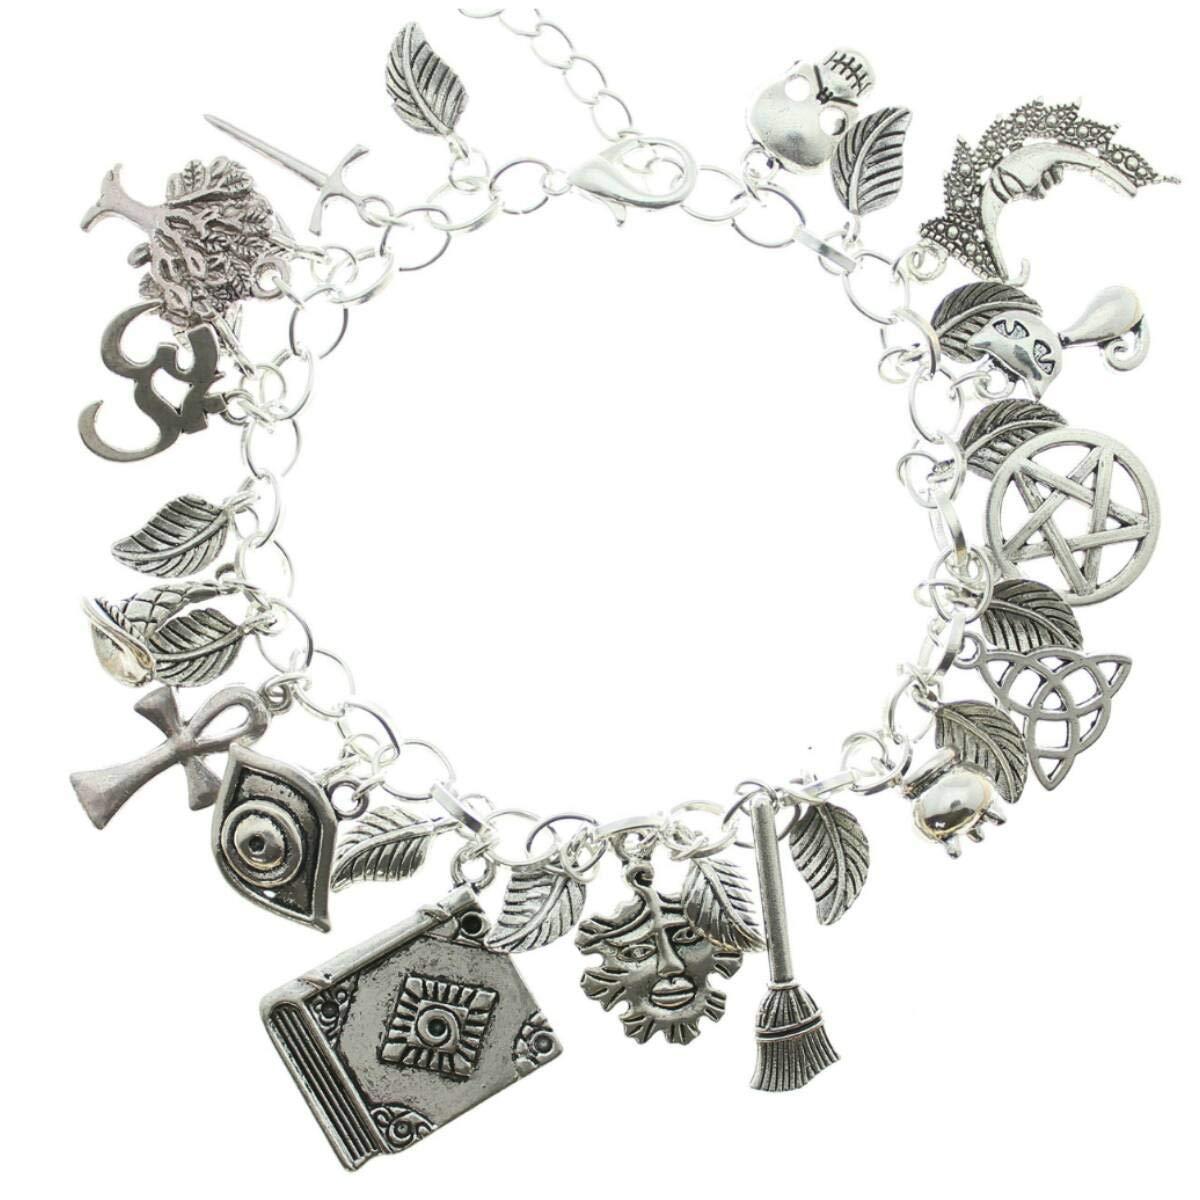 AVBeads Jewelry Wiccan Charm Bracelet Witch Pagan Wicca Silver Metal (1609)